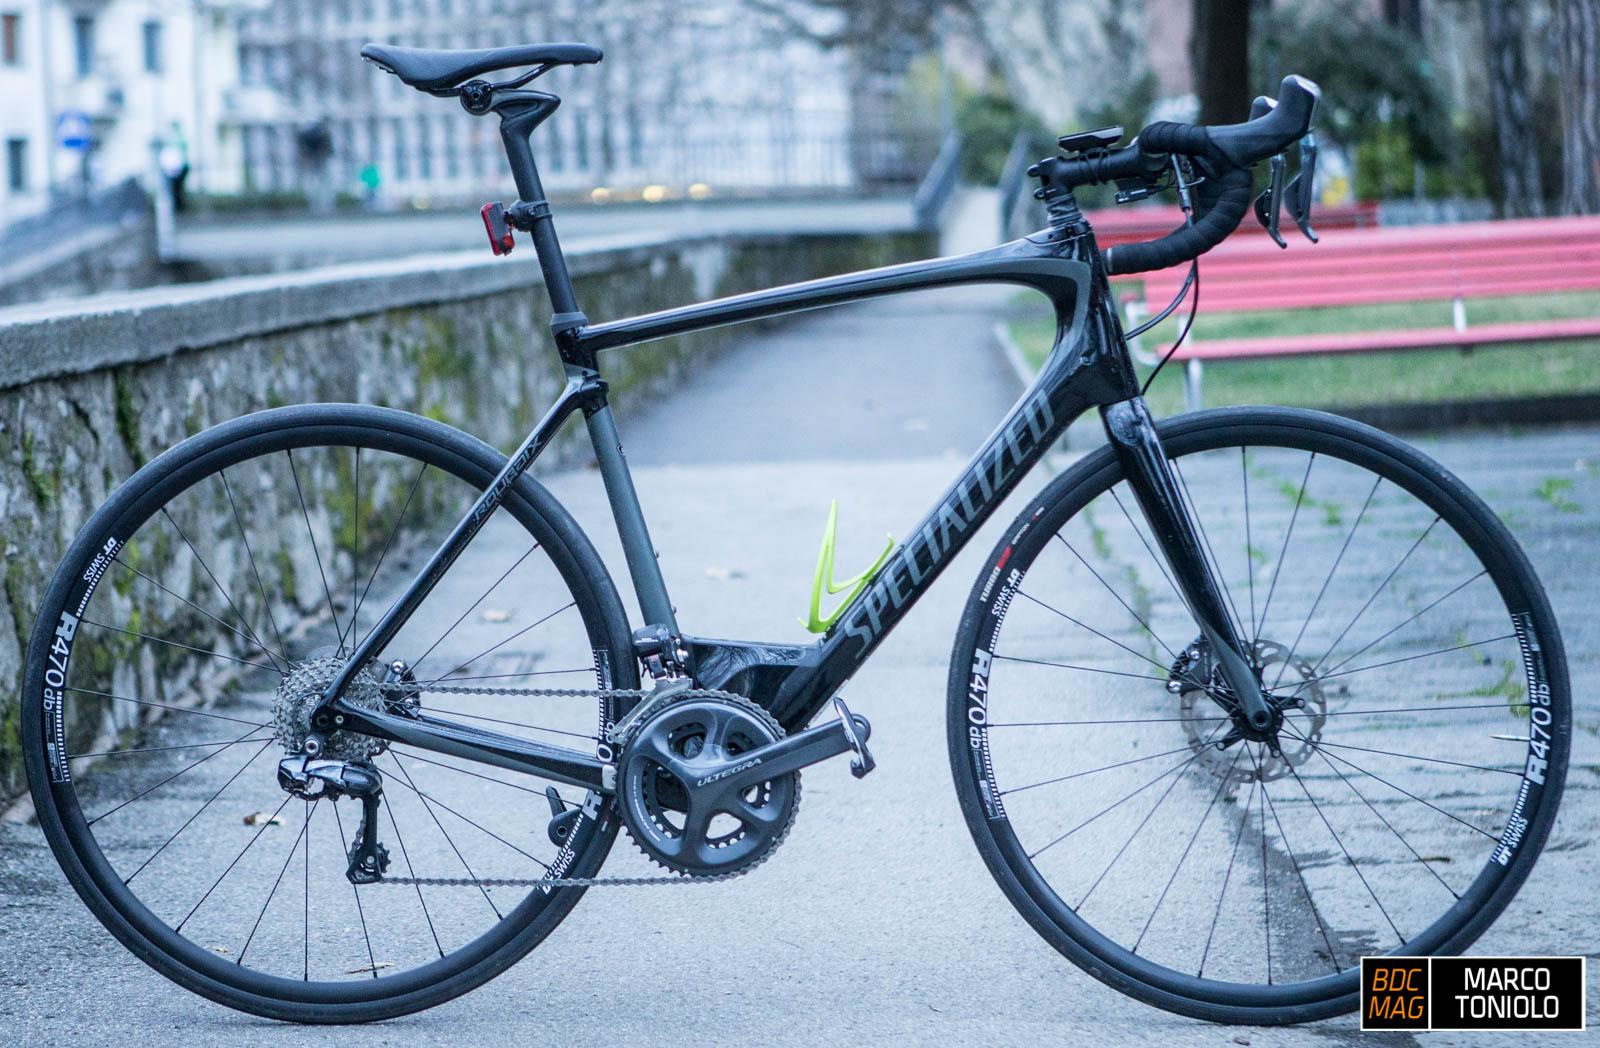 [Test] Specialized Roubaix Ultegra DI2